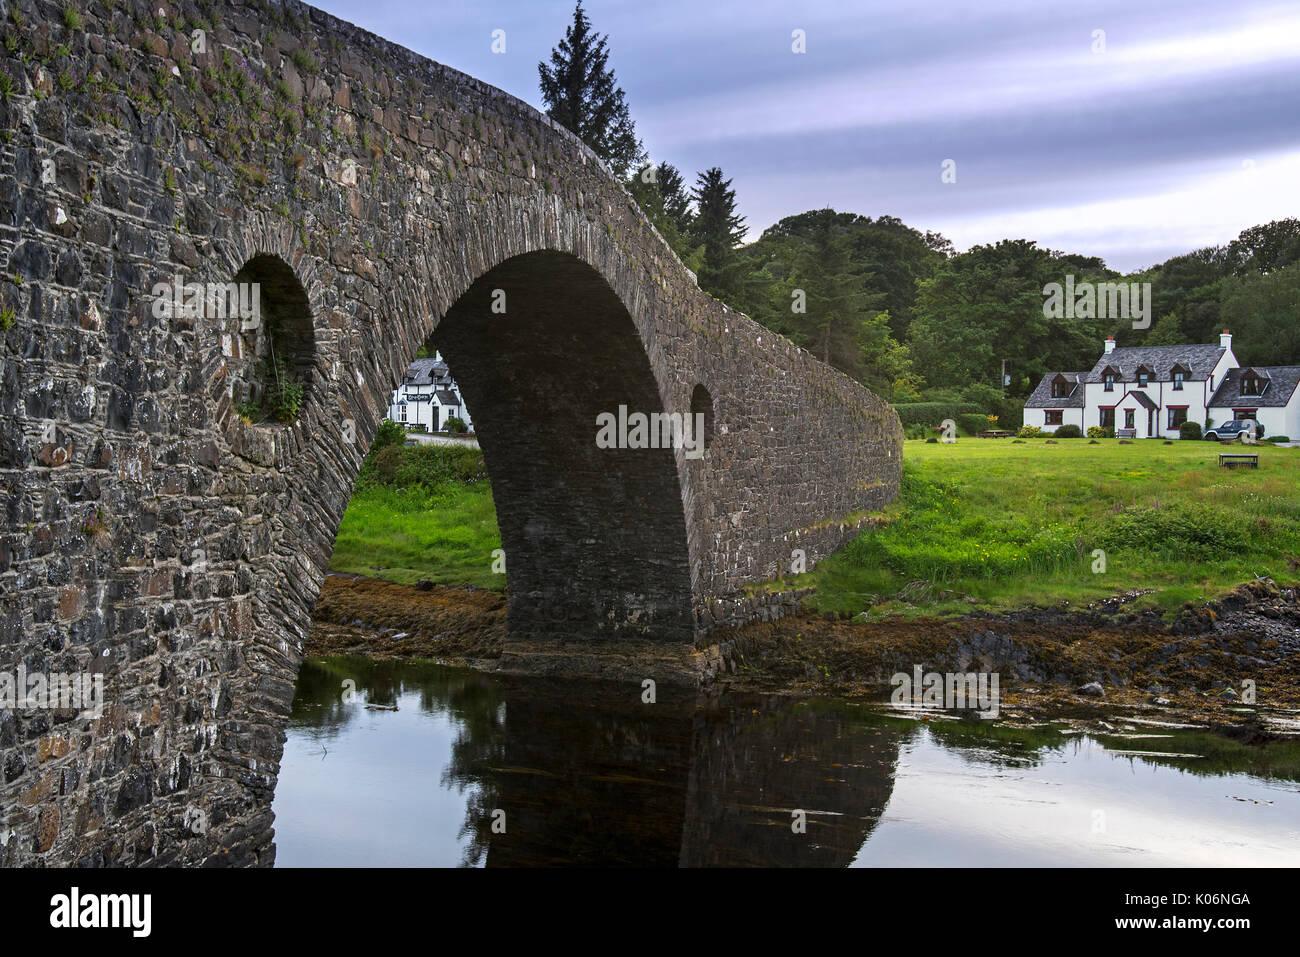 Clachan Bridge / Bridge over the Atlantic, single-arched, hump-backed masonry bridge spanning the Clachan Sound, Argyll, Scotland, UK - Stock Image